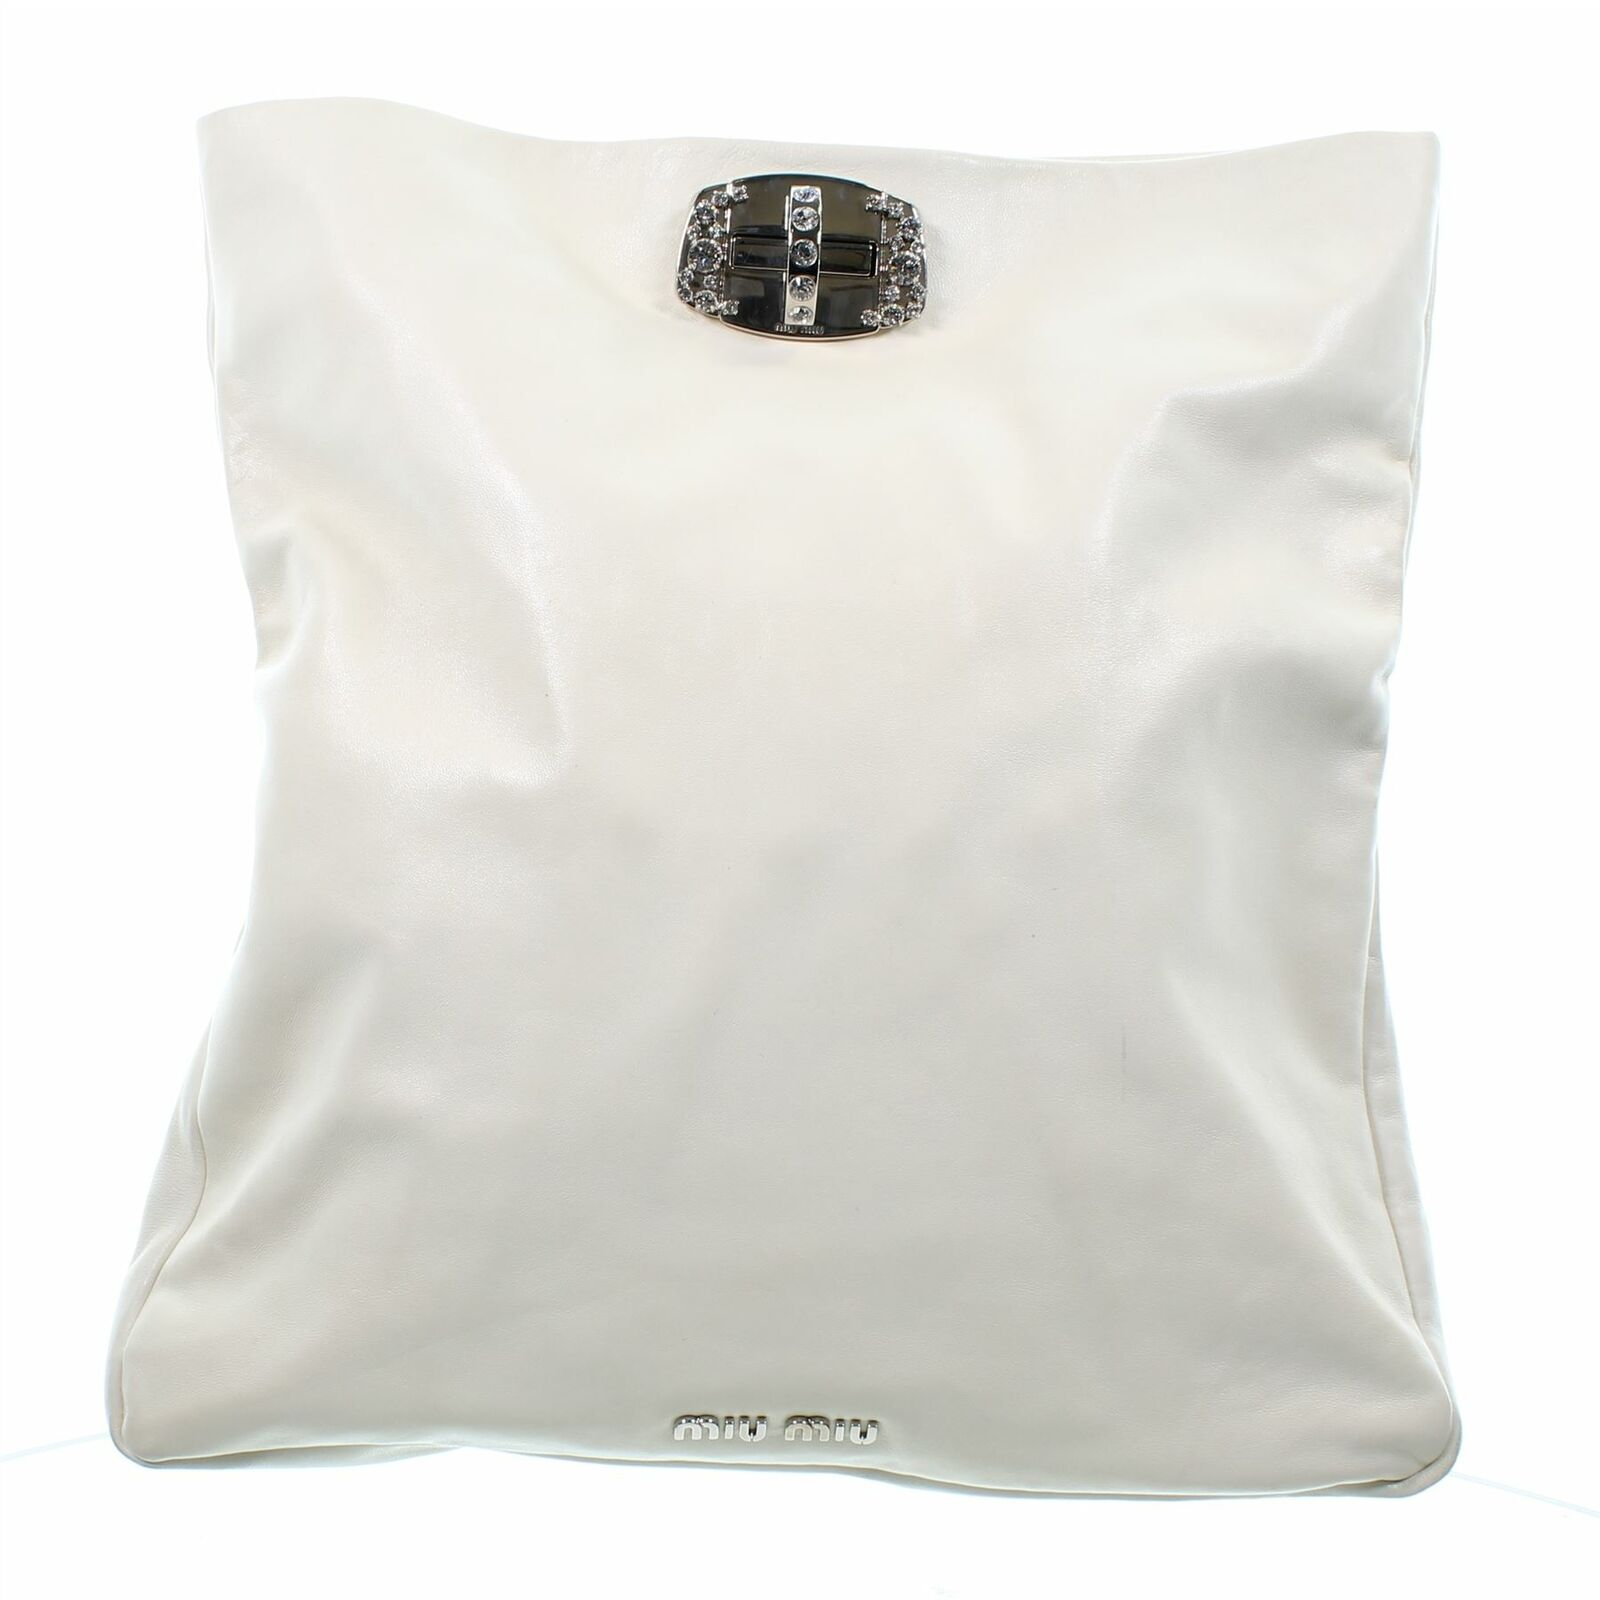 MIU MIU Crystal Chain Ivory Leather Handbag, 9